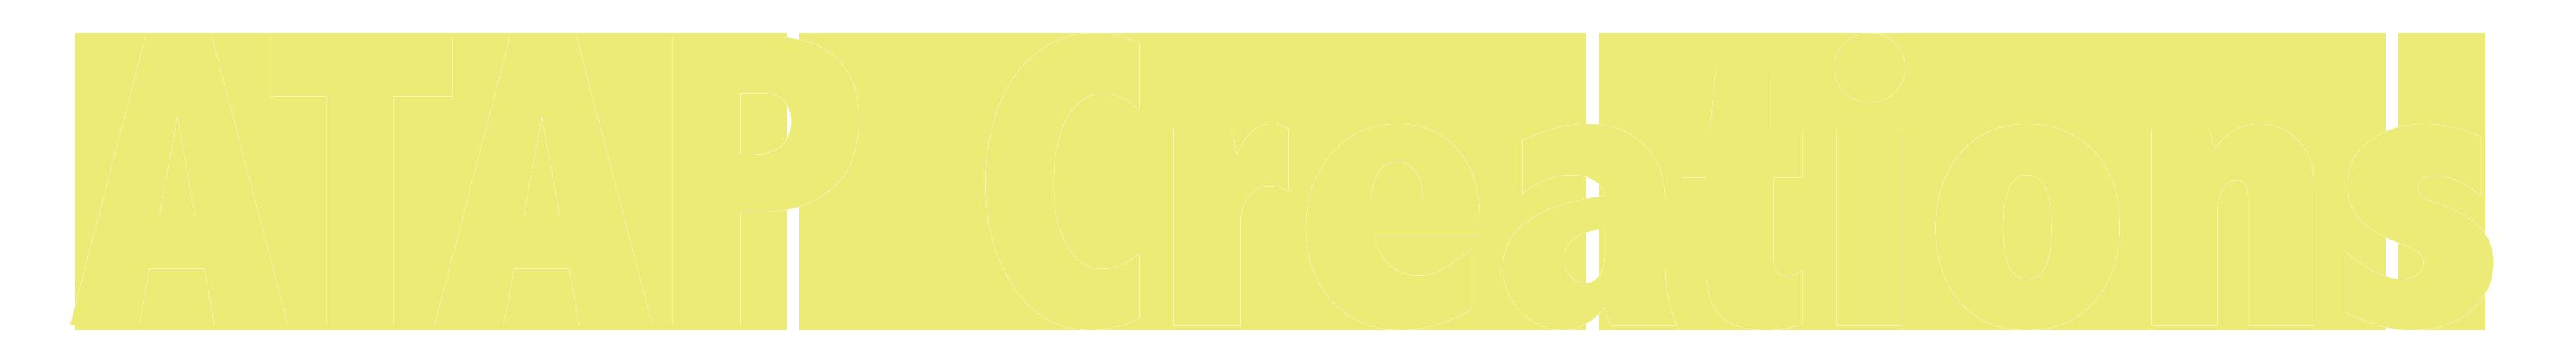 ATAP Creations